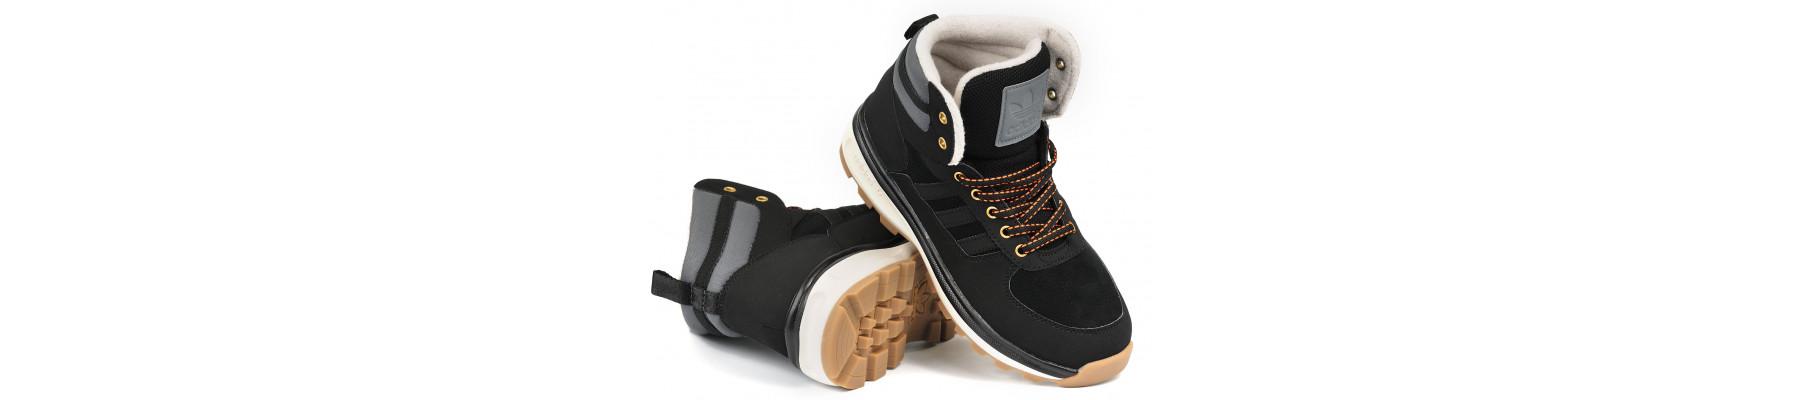 Adidas Chasker Boot CBlackCbr